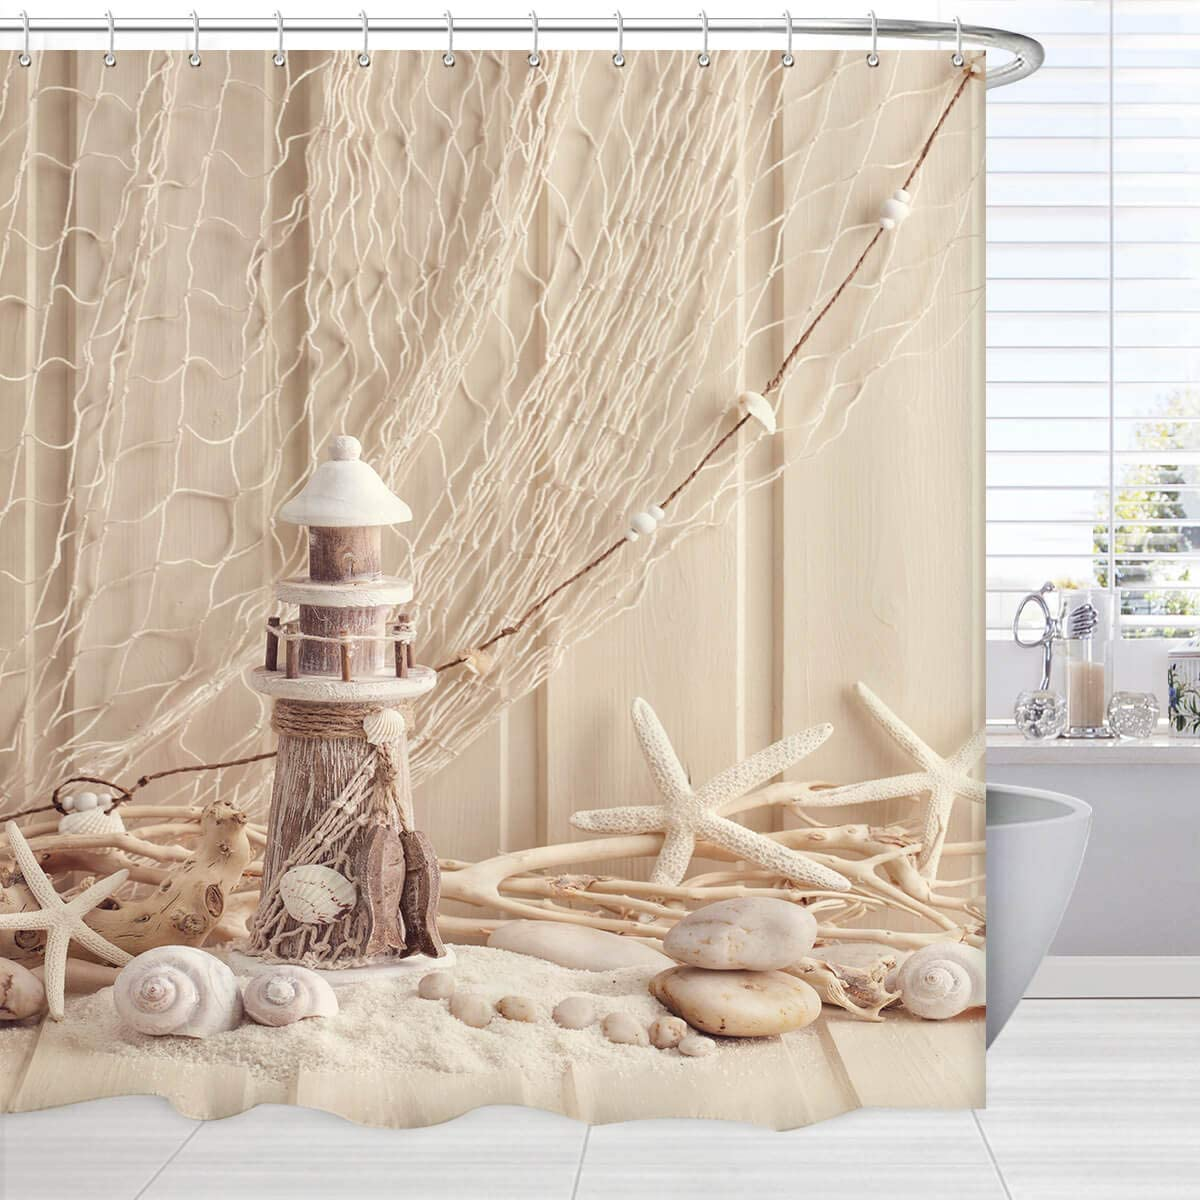 BROSHAN Nautical Decor Shower Curtain Extra Long, Coastal Sea Shell Fishing Net Lighthouse Starfish Ocean Beach Theme Bath Curtain Beige, Marine Fabric Bathroom Decor Set, 84 Inches Long